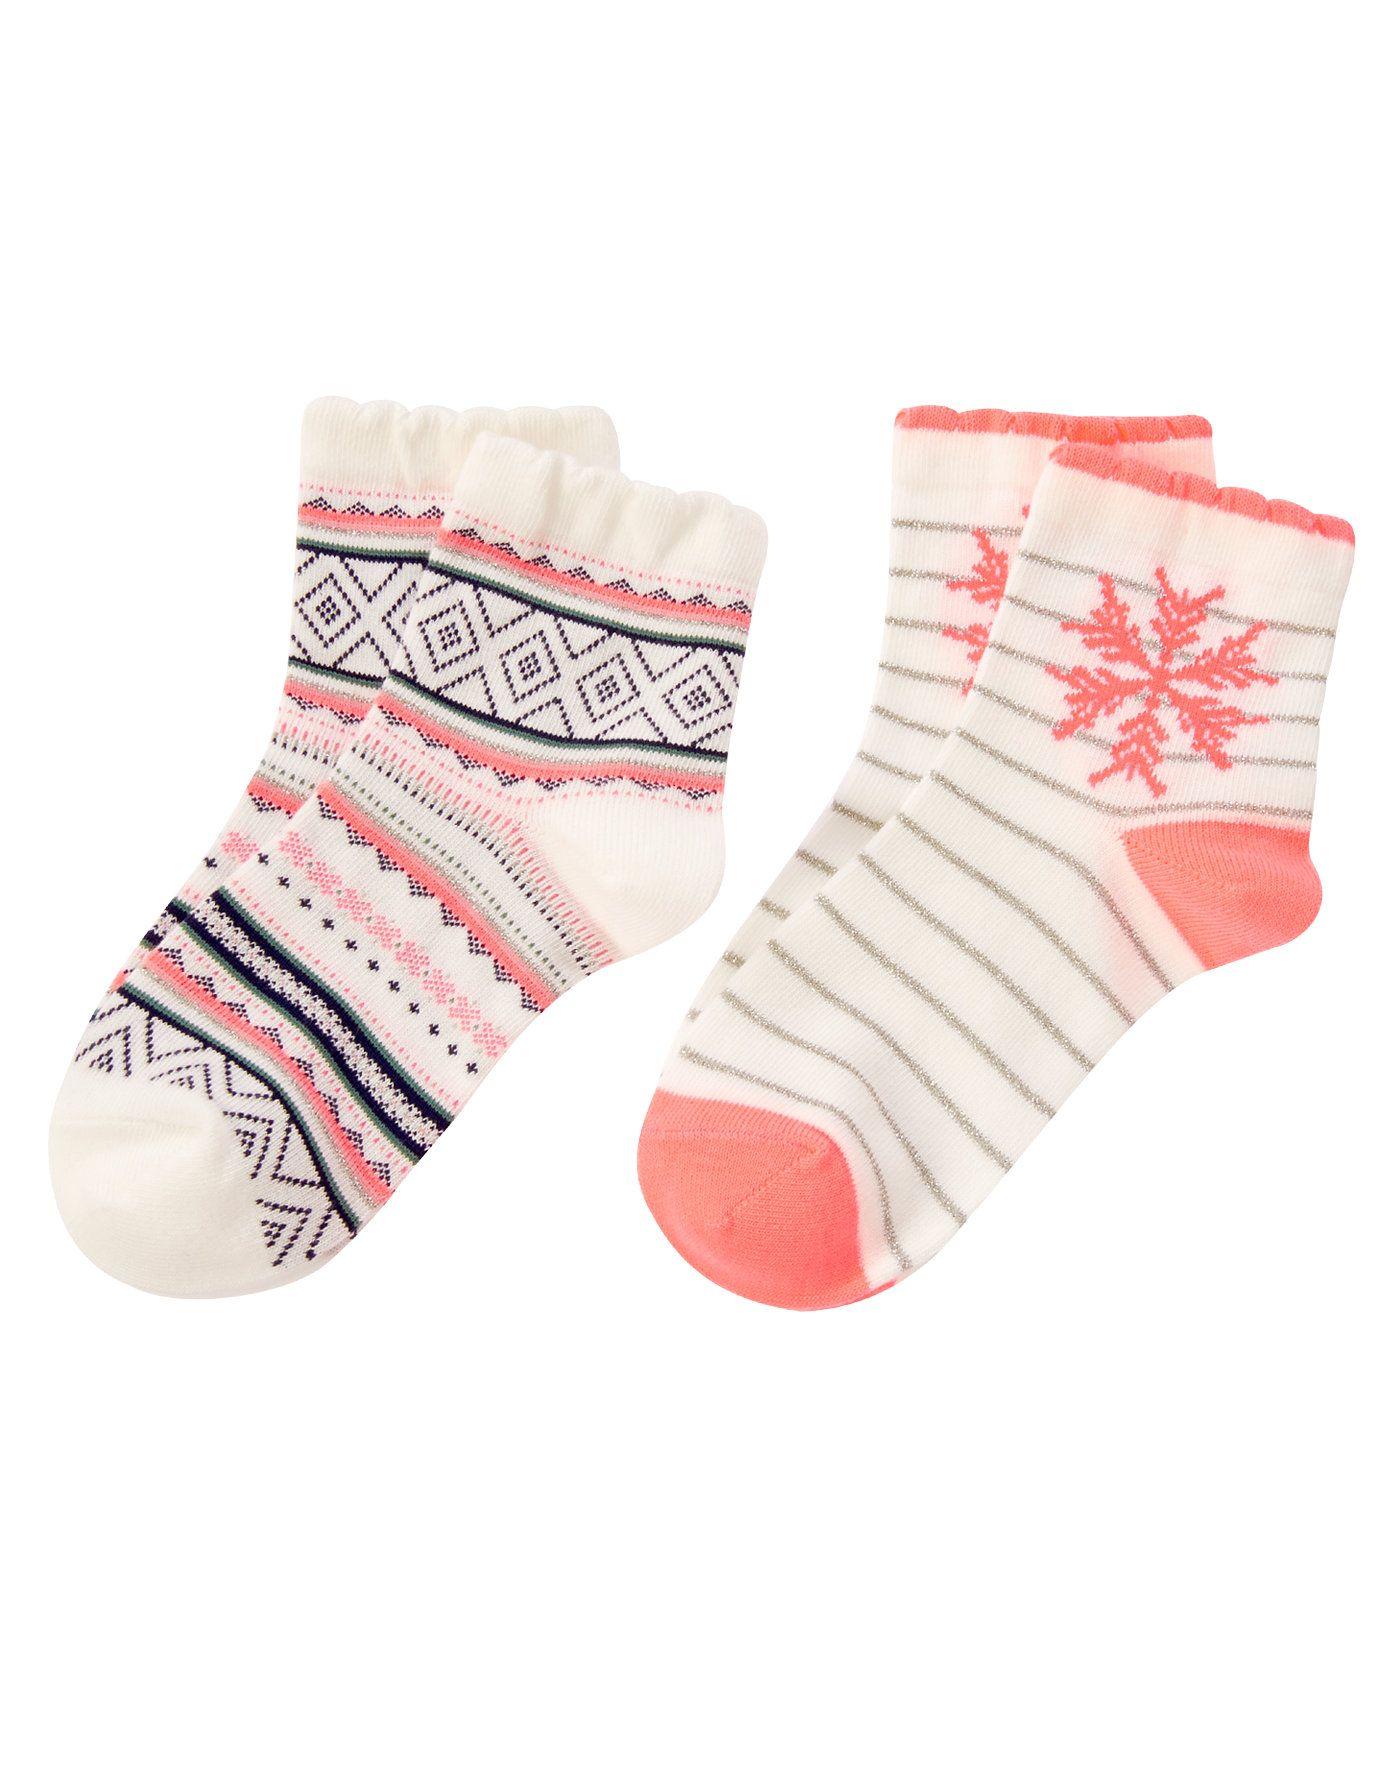 Fair Isle & Snowflake Socks Two Pack at Gymboree Gymboree 3 12y